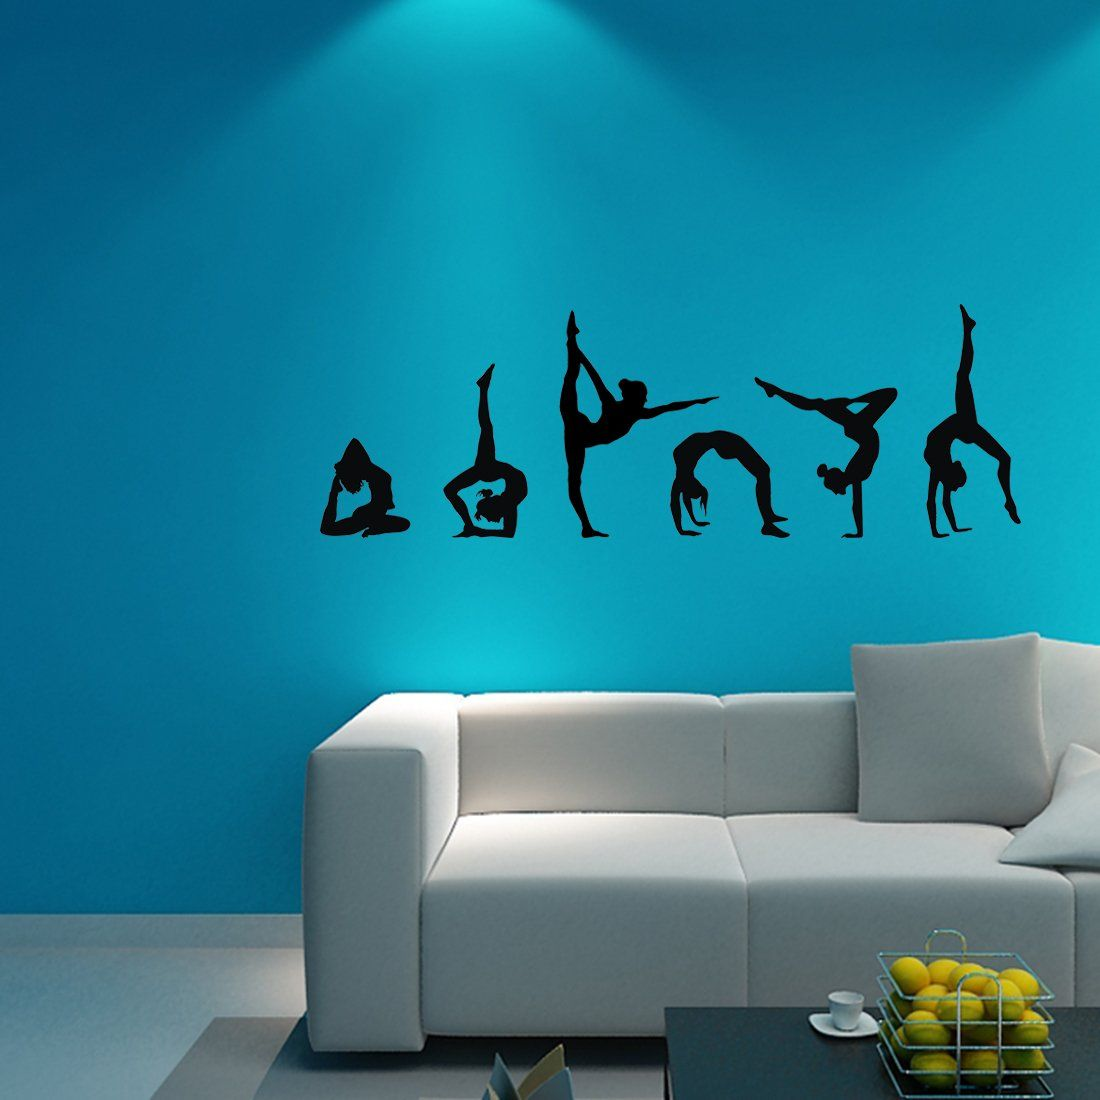 Easma Gymnastics Wall Decals Silhouettes Sport Art Girl